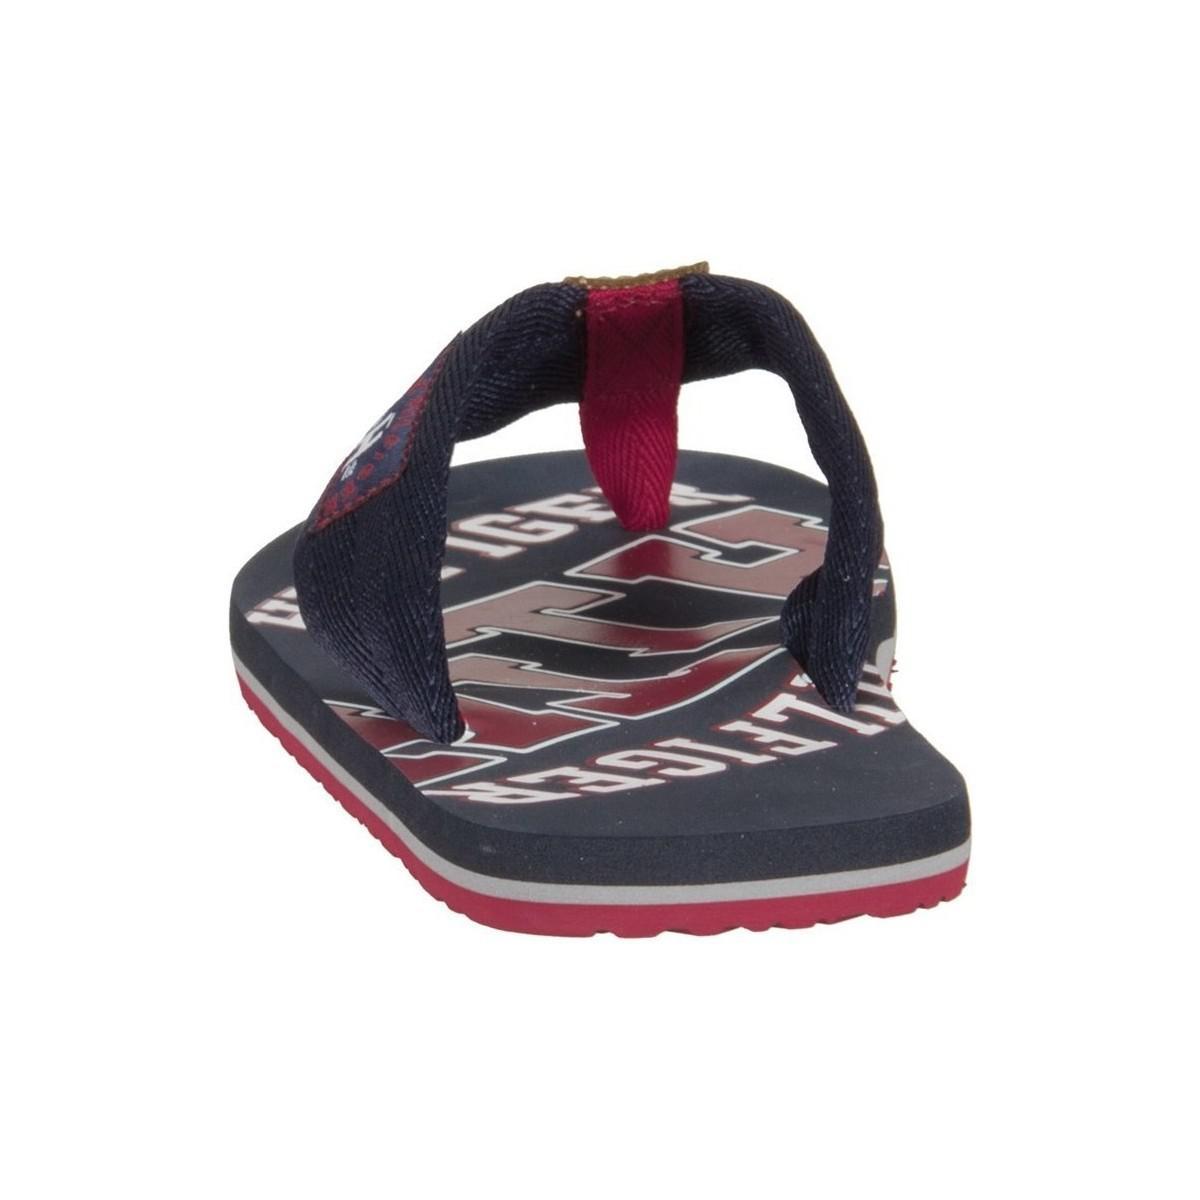 b4f87be6e Tommy Hilfiger Essential Th Beach Sandal Midnight Men s Flip Flops ...